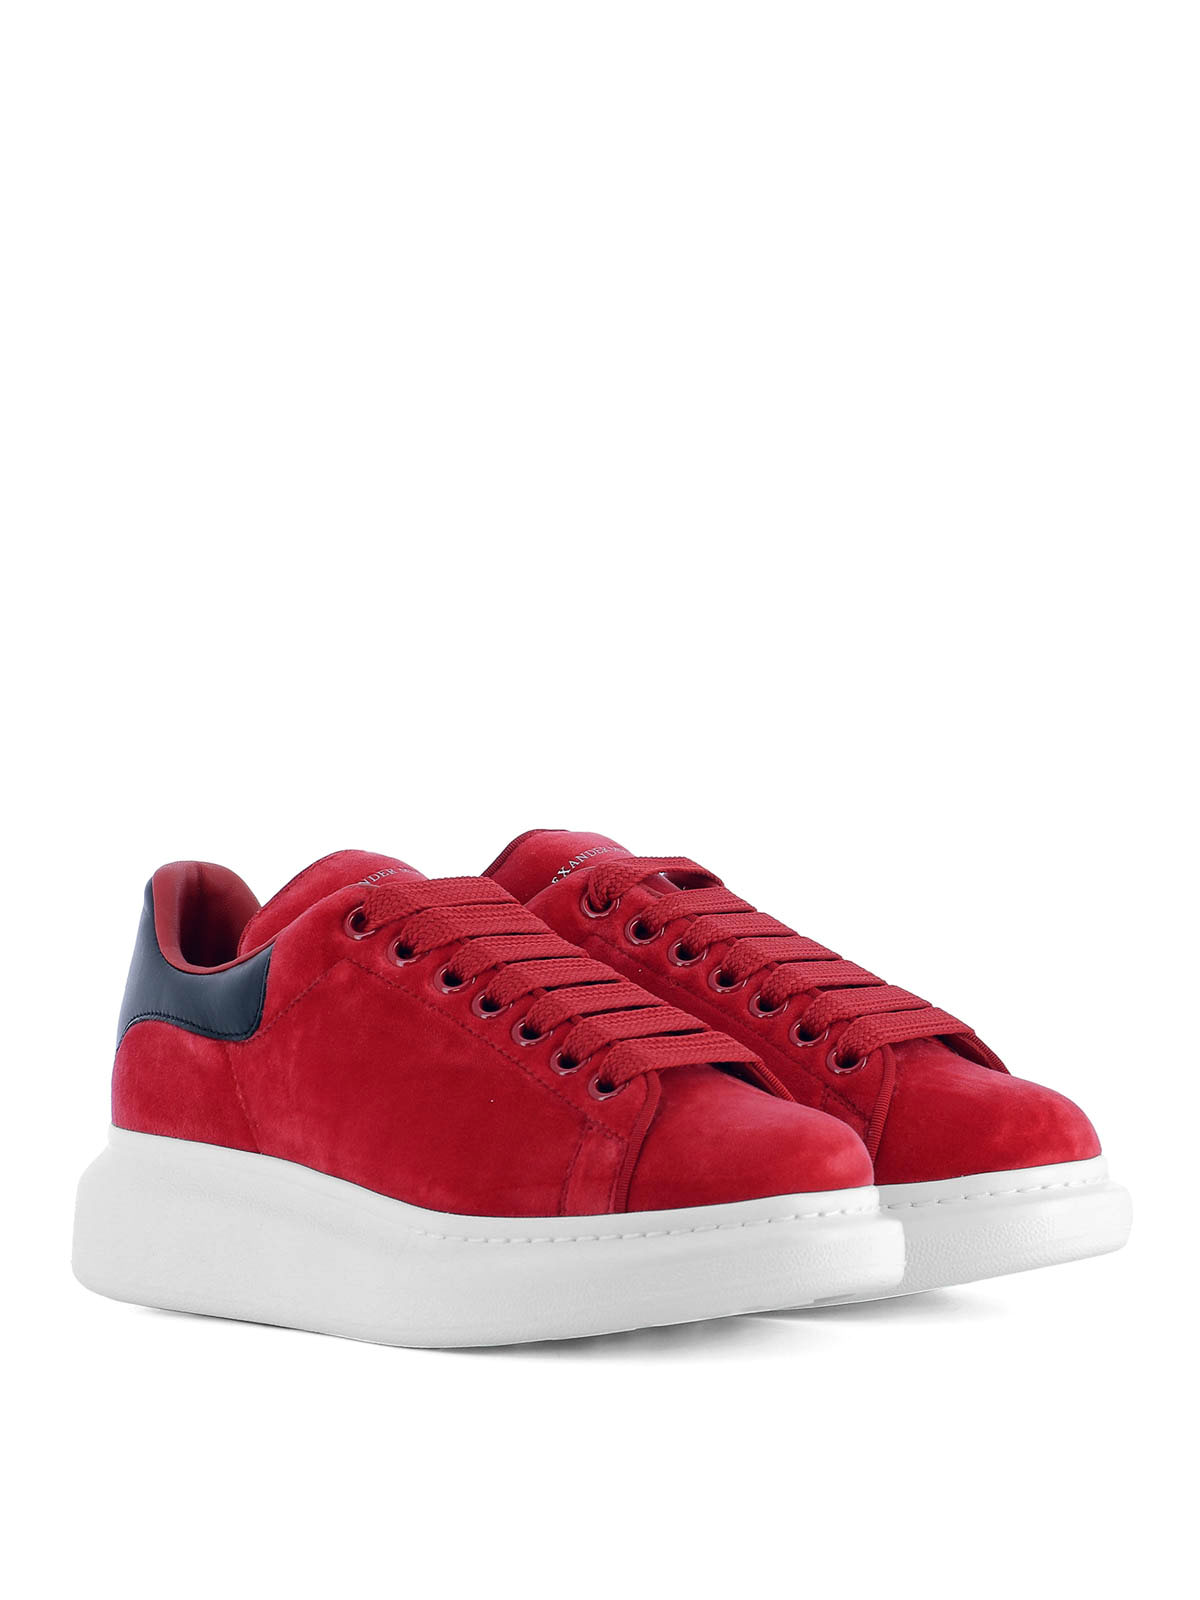 a0c3b004e9e5 ALEXANDER MCQUEEN  trainers online - Oversize red velvet sneakers